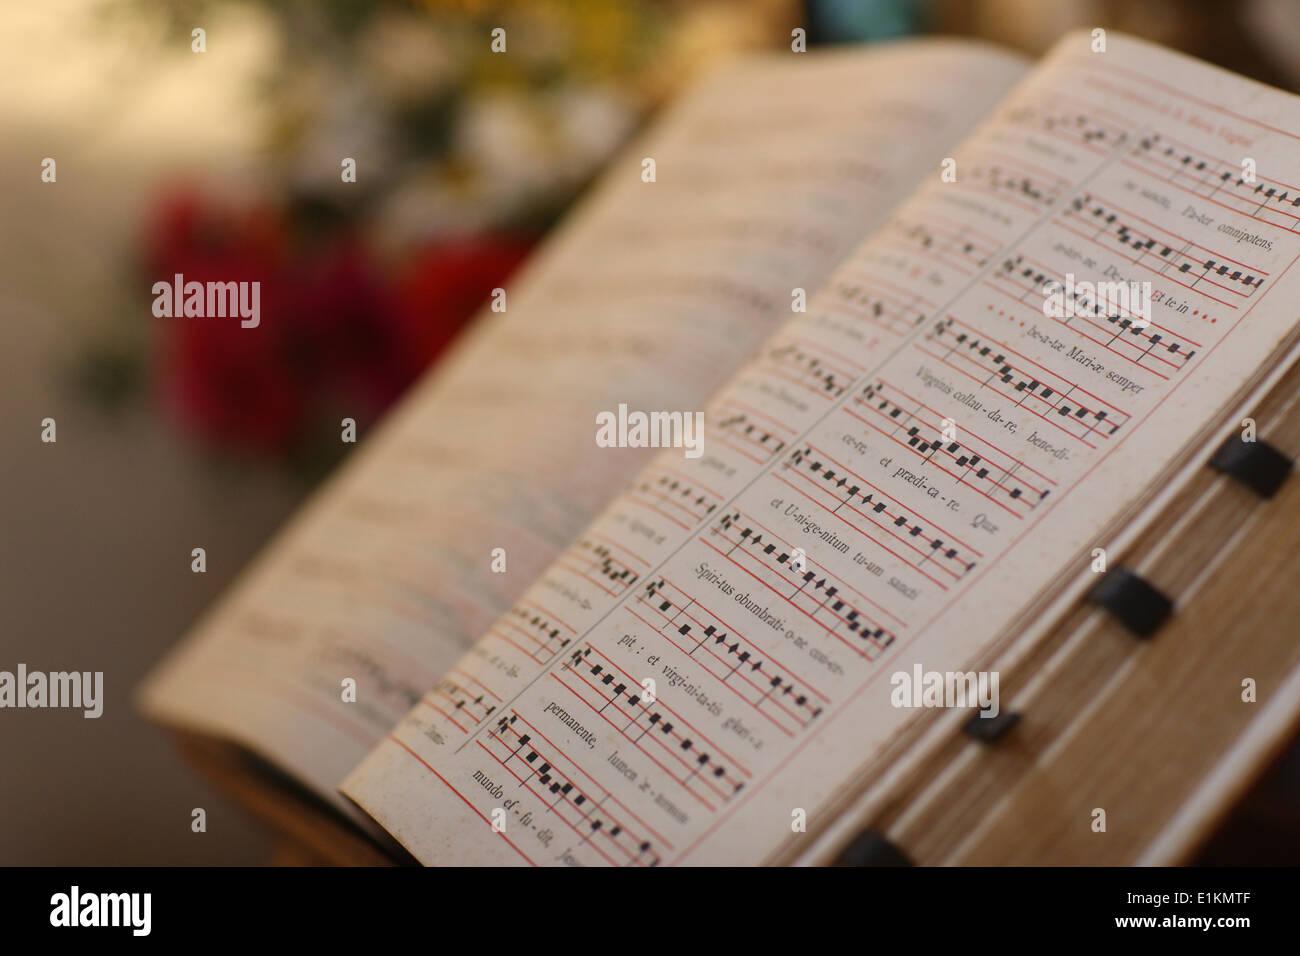 Puntuación de música religiosa Imagen De Stock